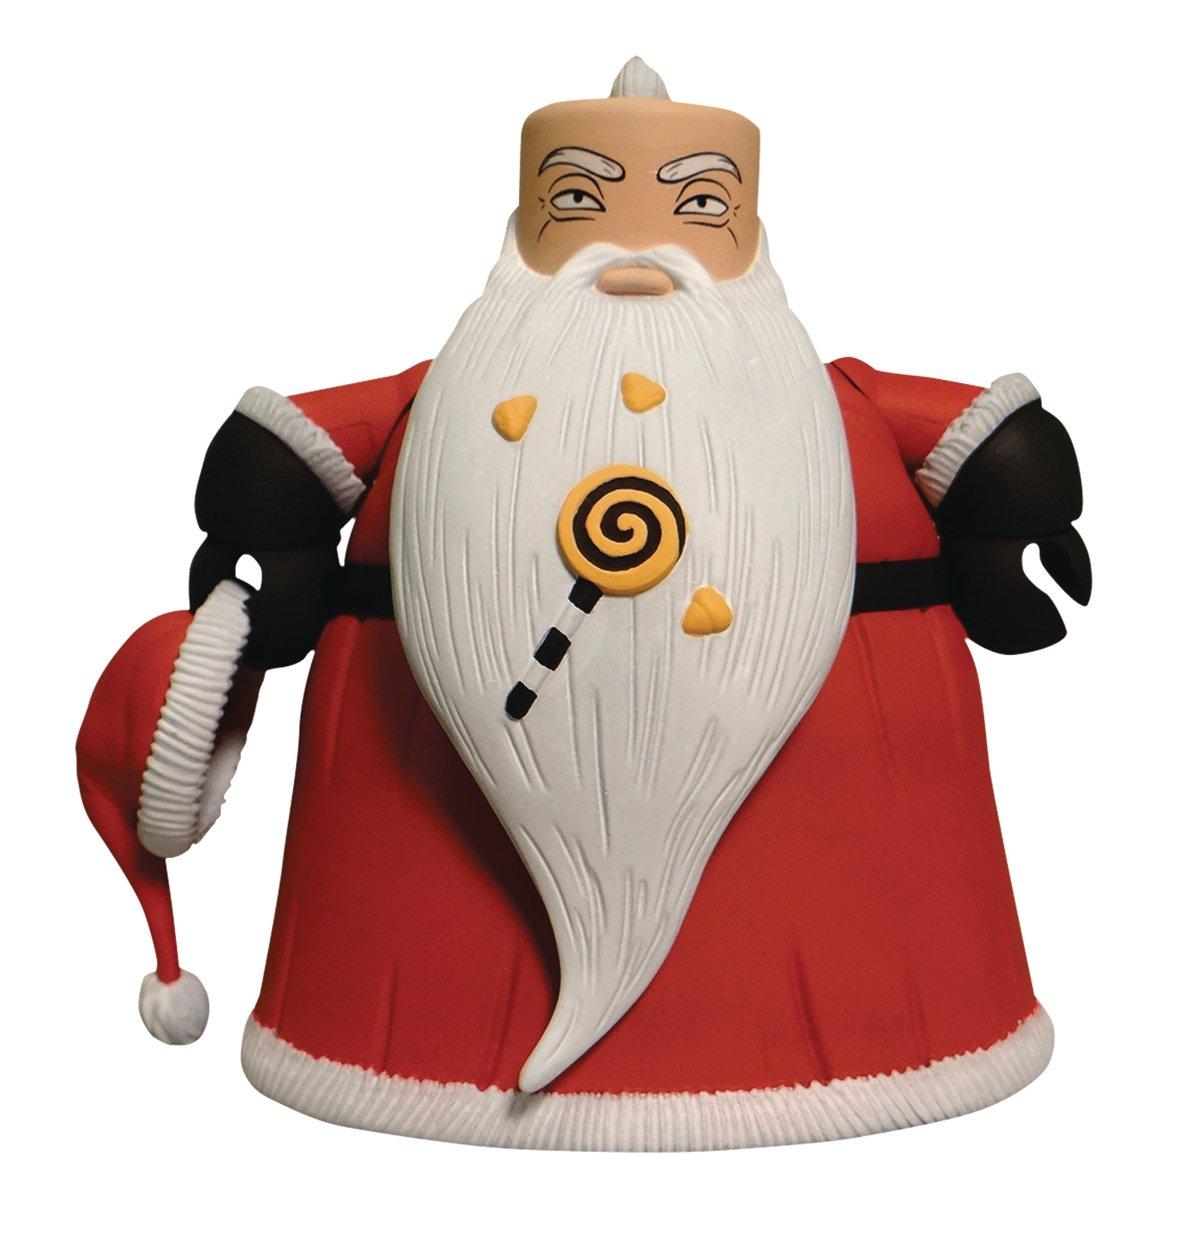 Diamond Select Toys The Nightmare Before Christmas Santa Claus Vinimate Figure MAR172740